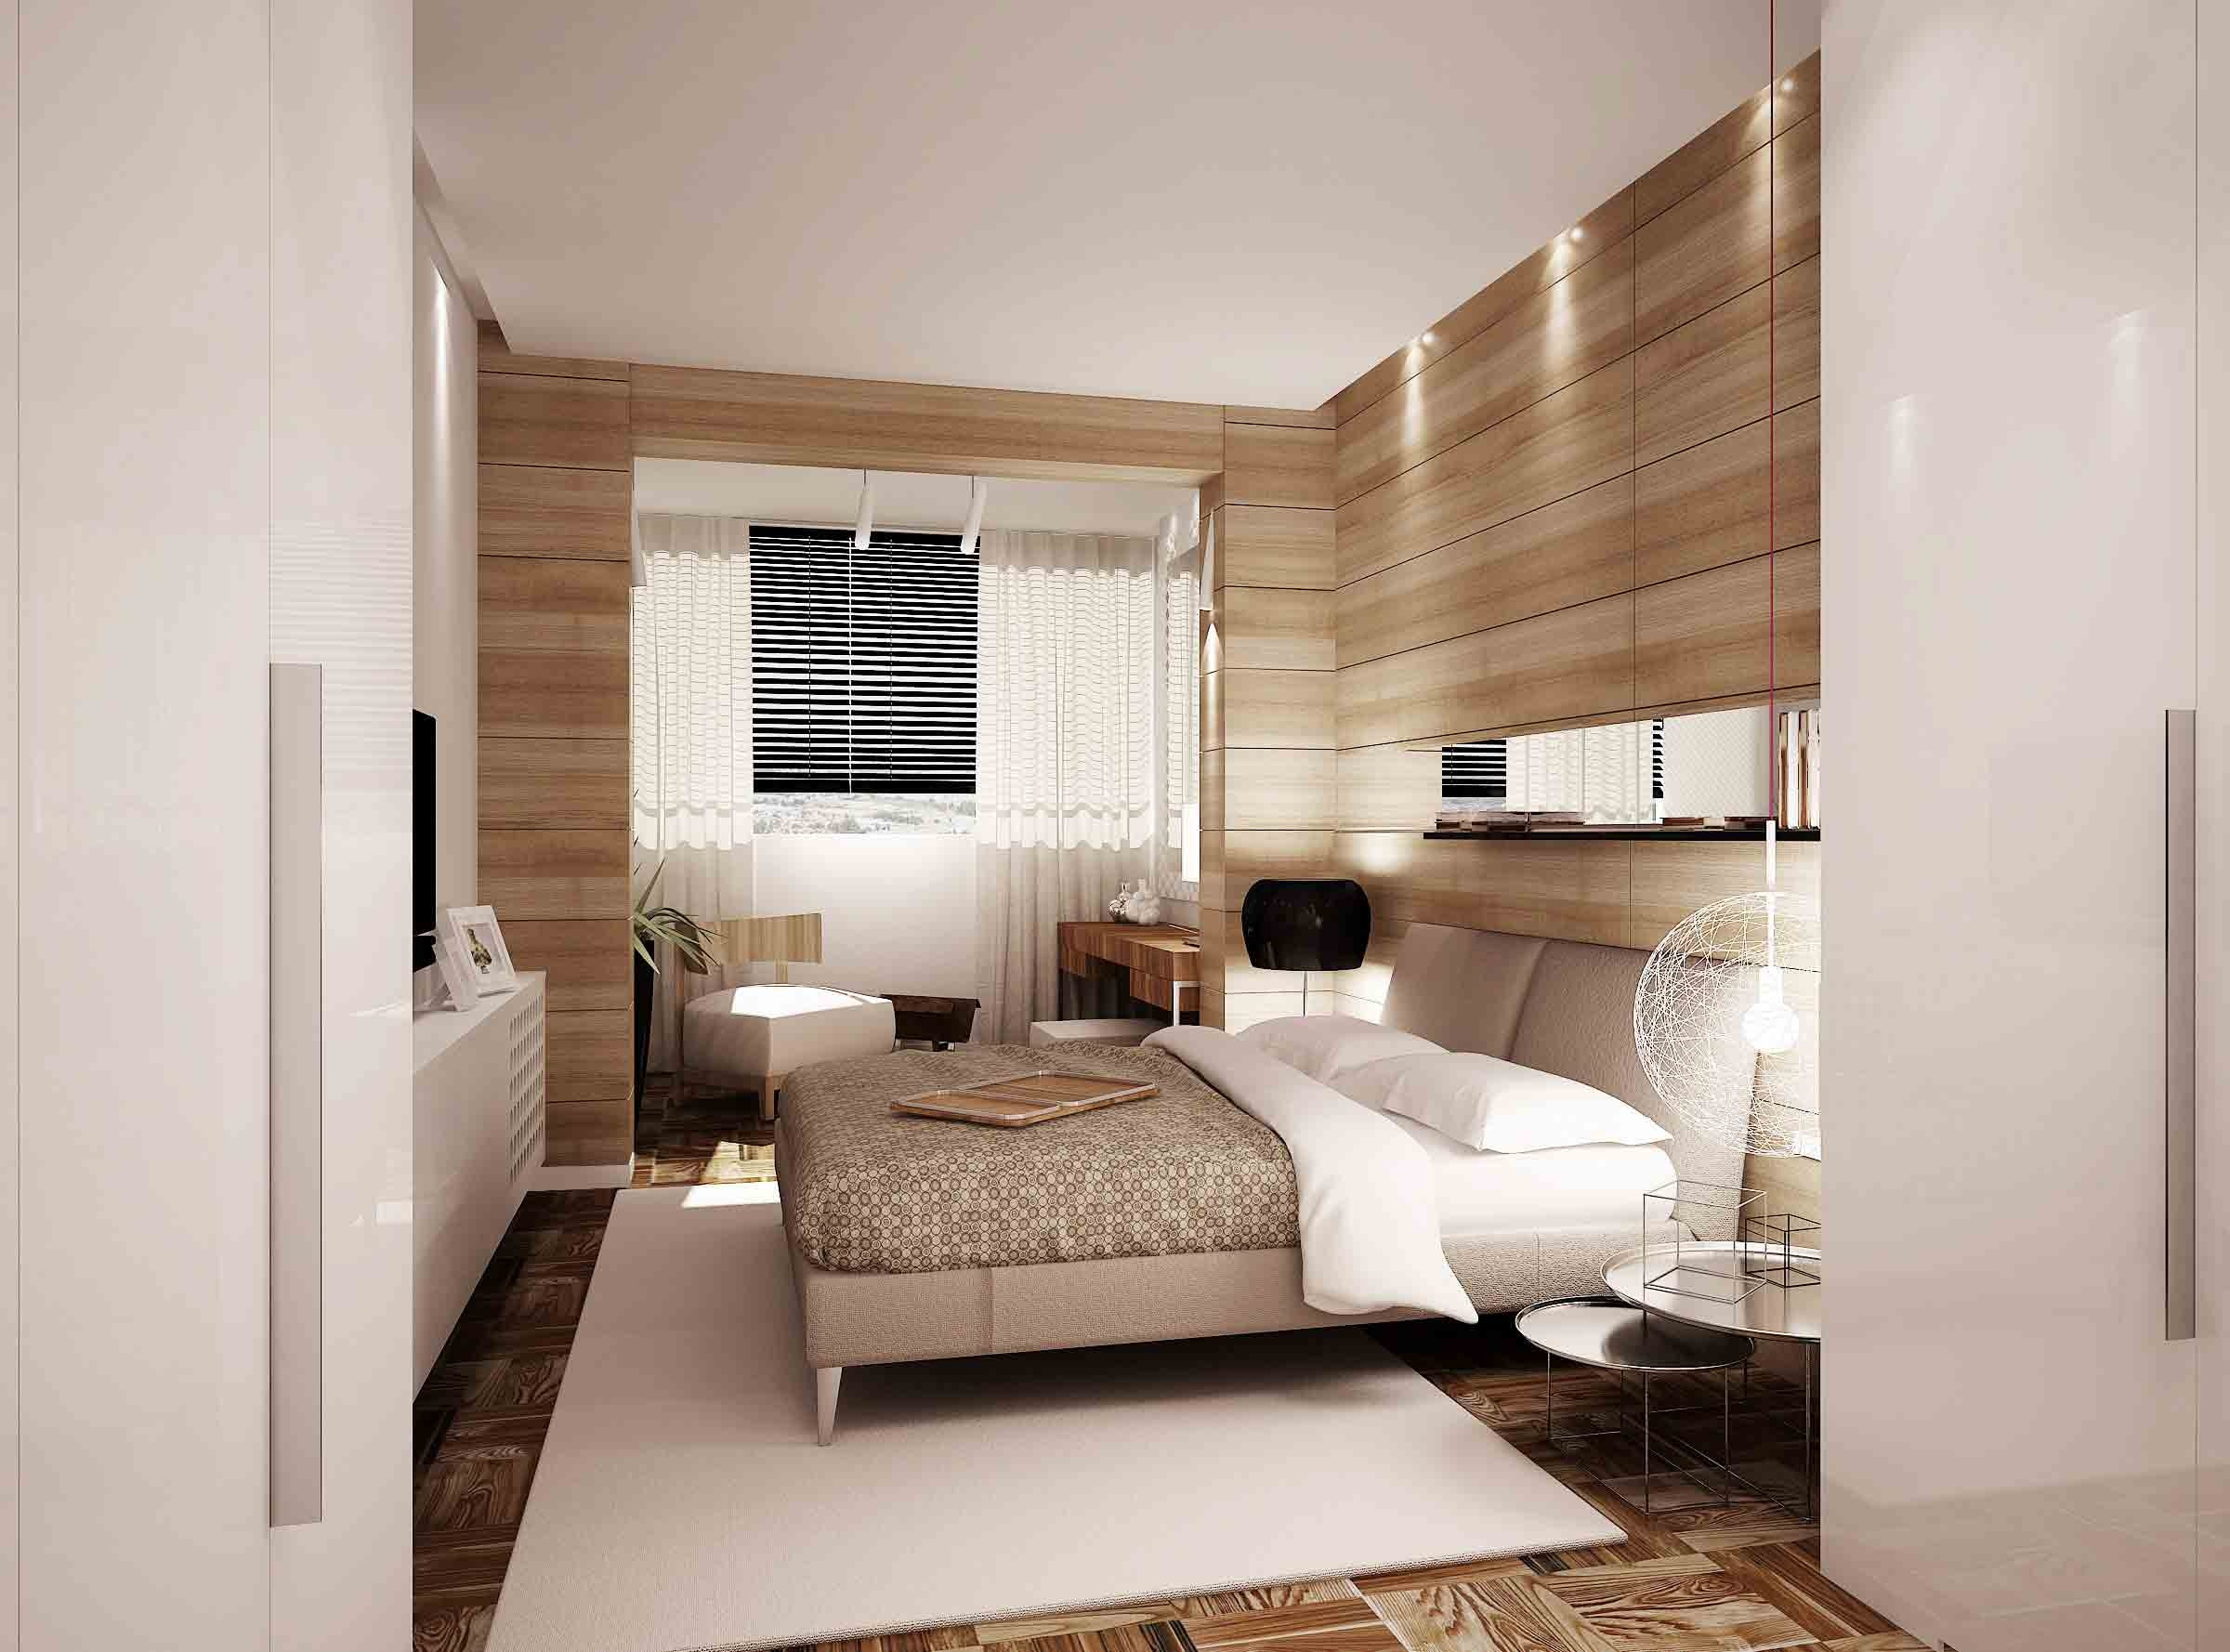 12x15 Bedroom Design Ideas House Decor Interior